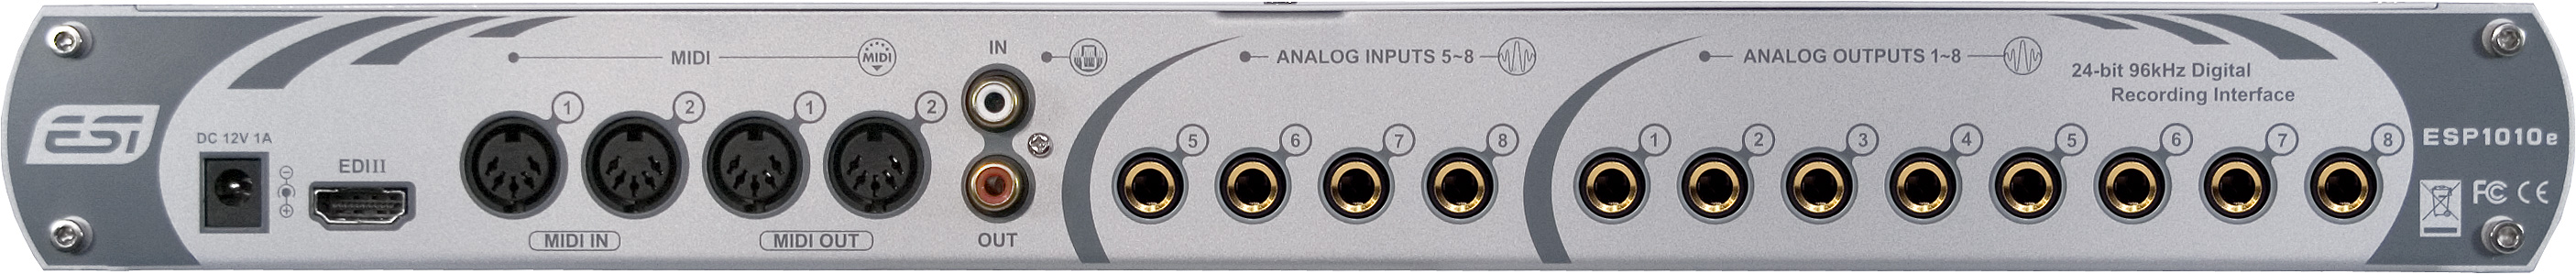 Download Drivers: ESI ESP1010e Audio Interface